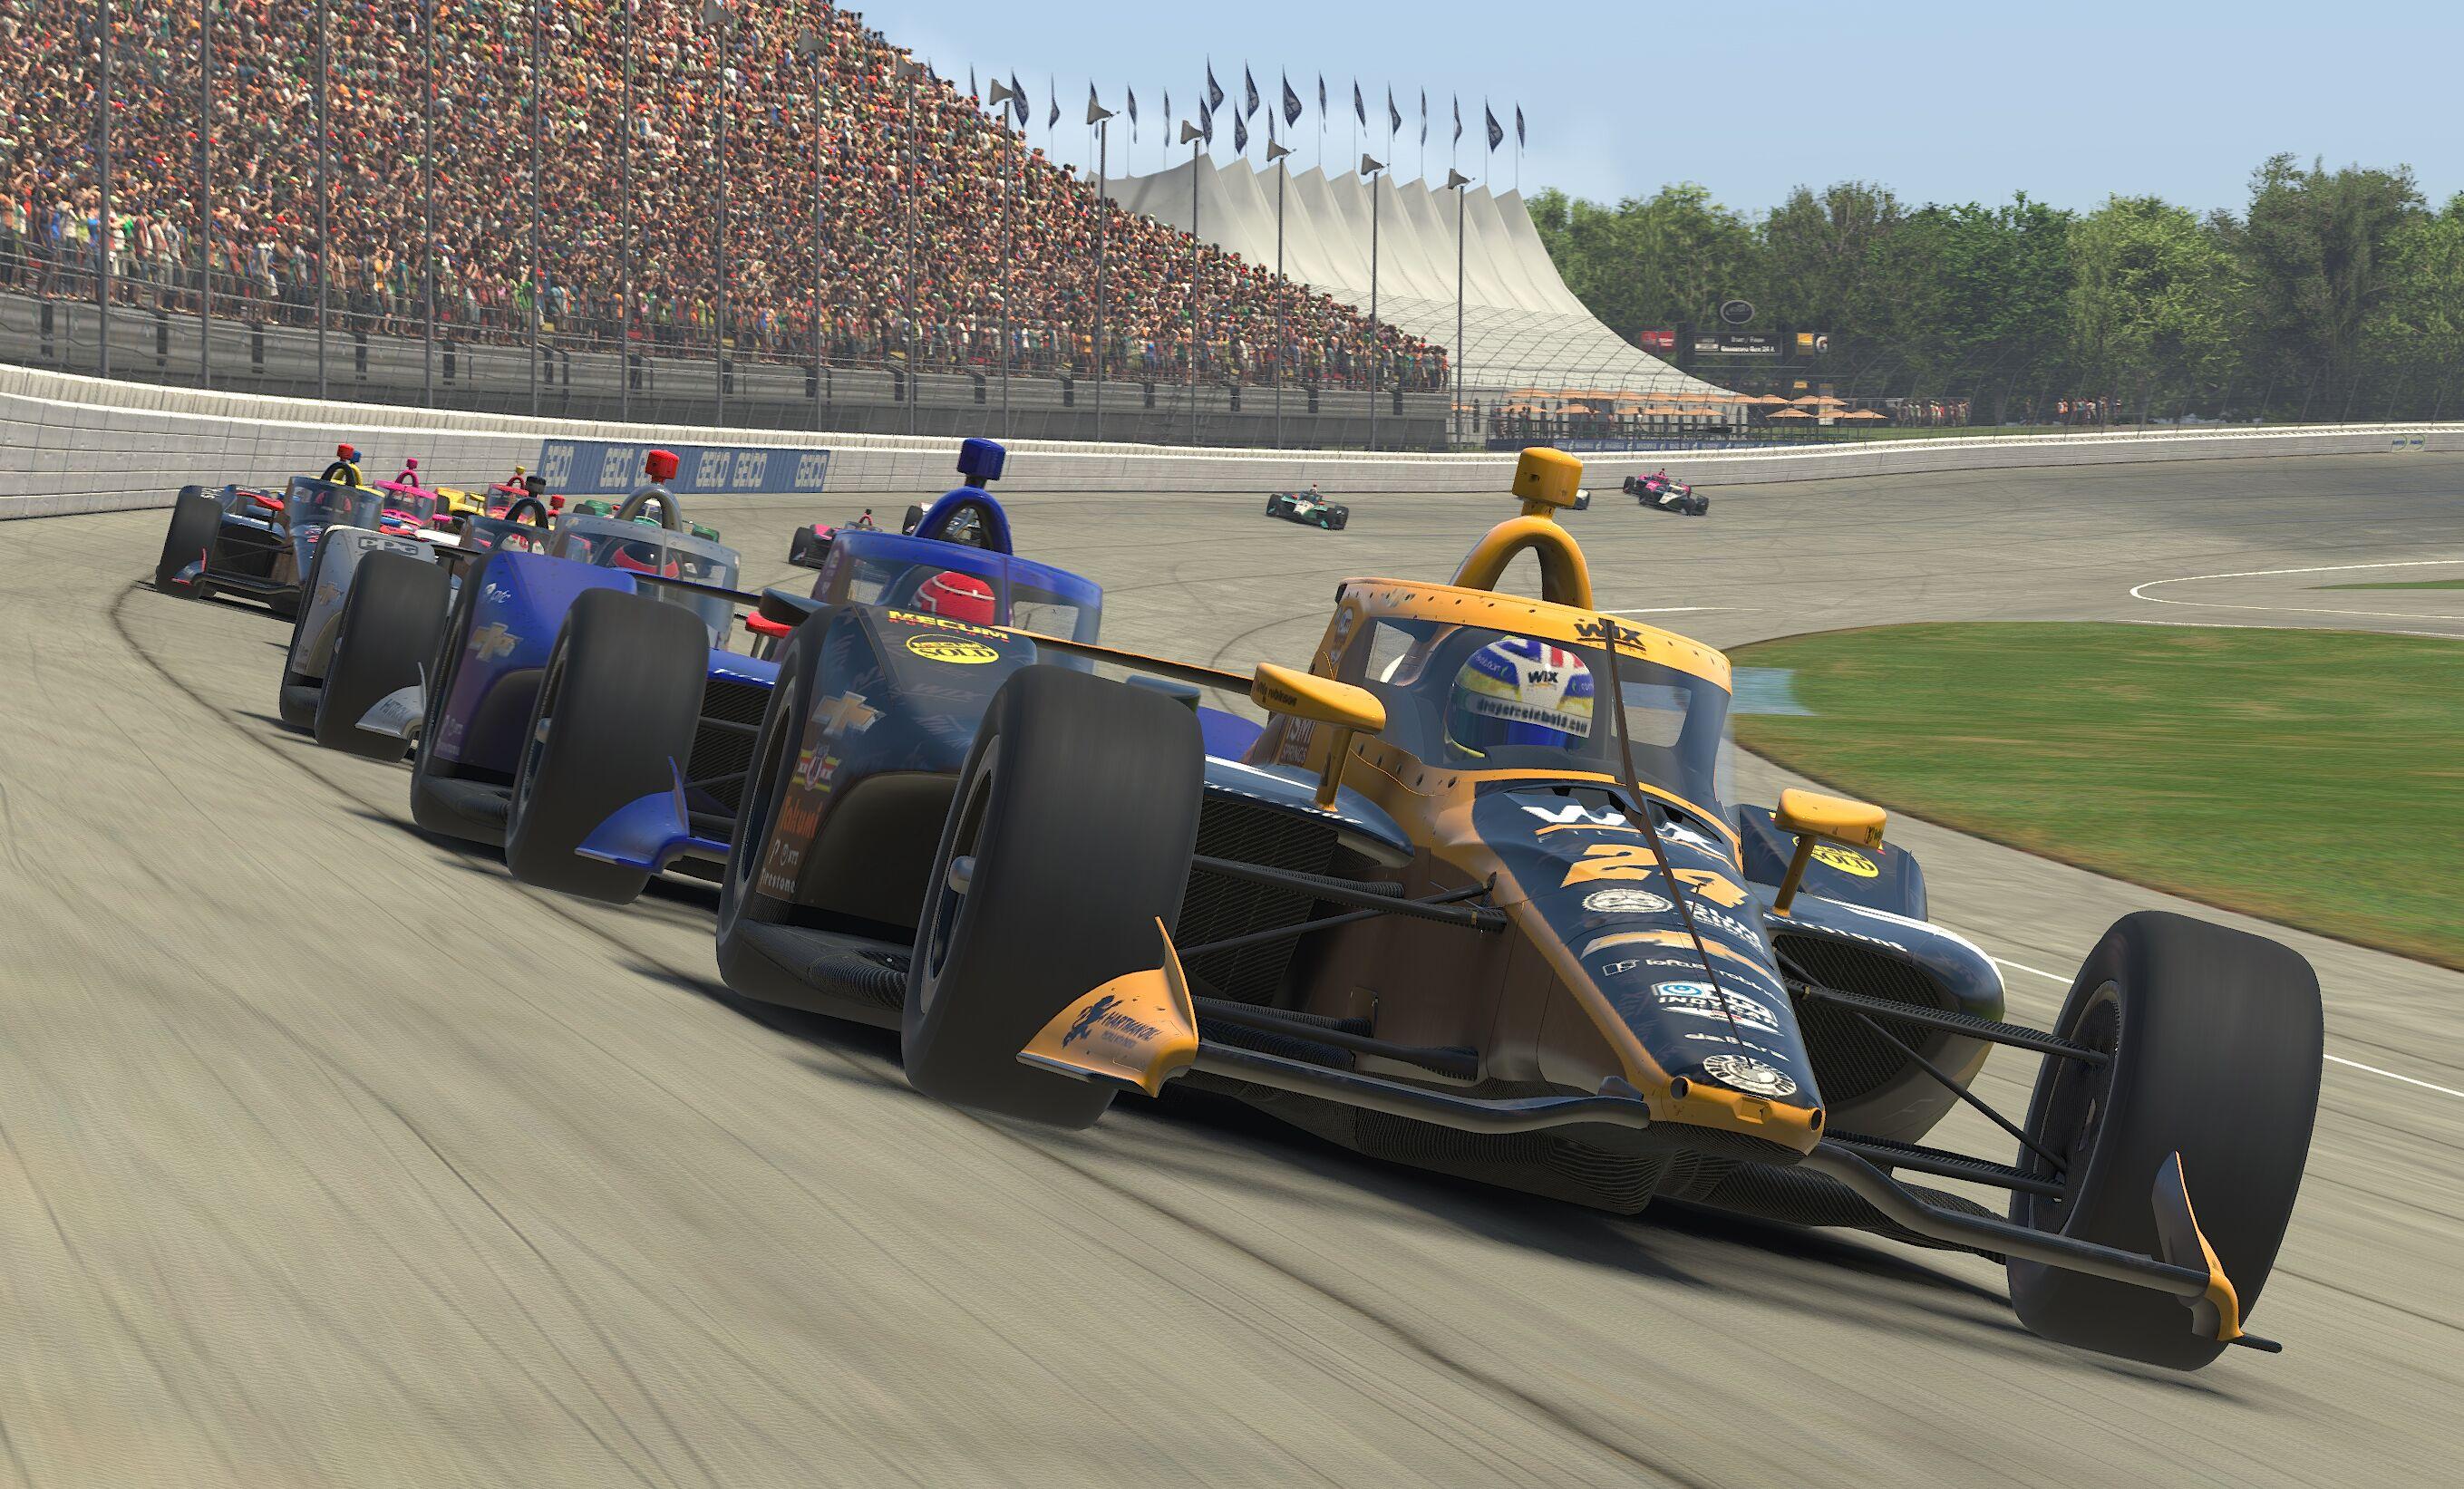 Sage Karam leads the field at virtual Michigan International Speedway